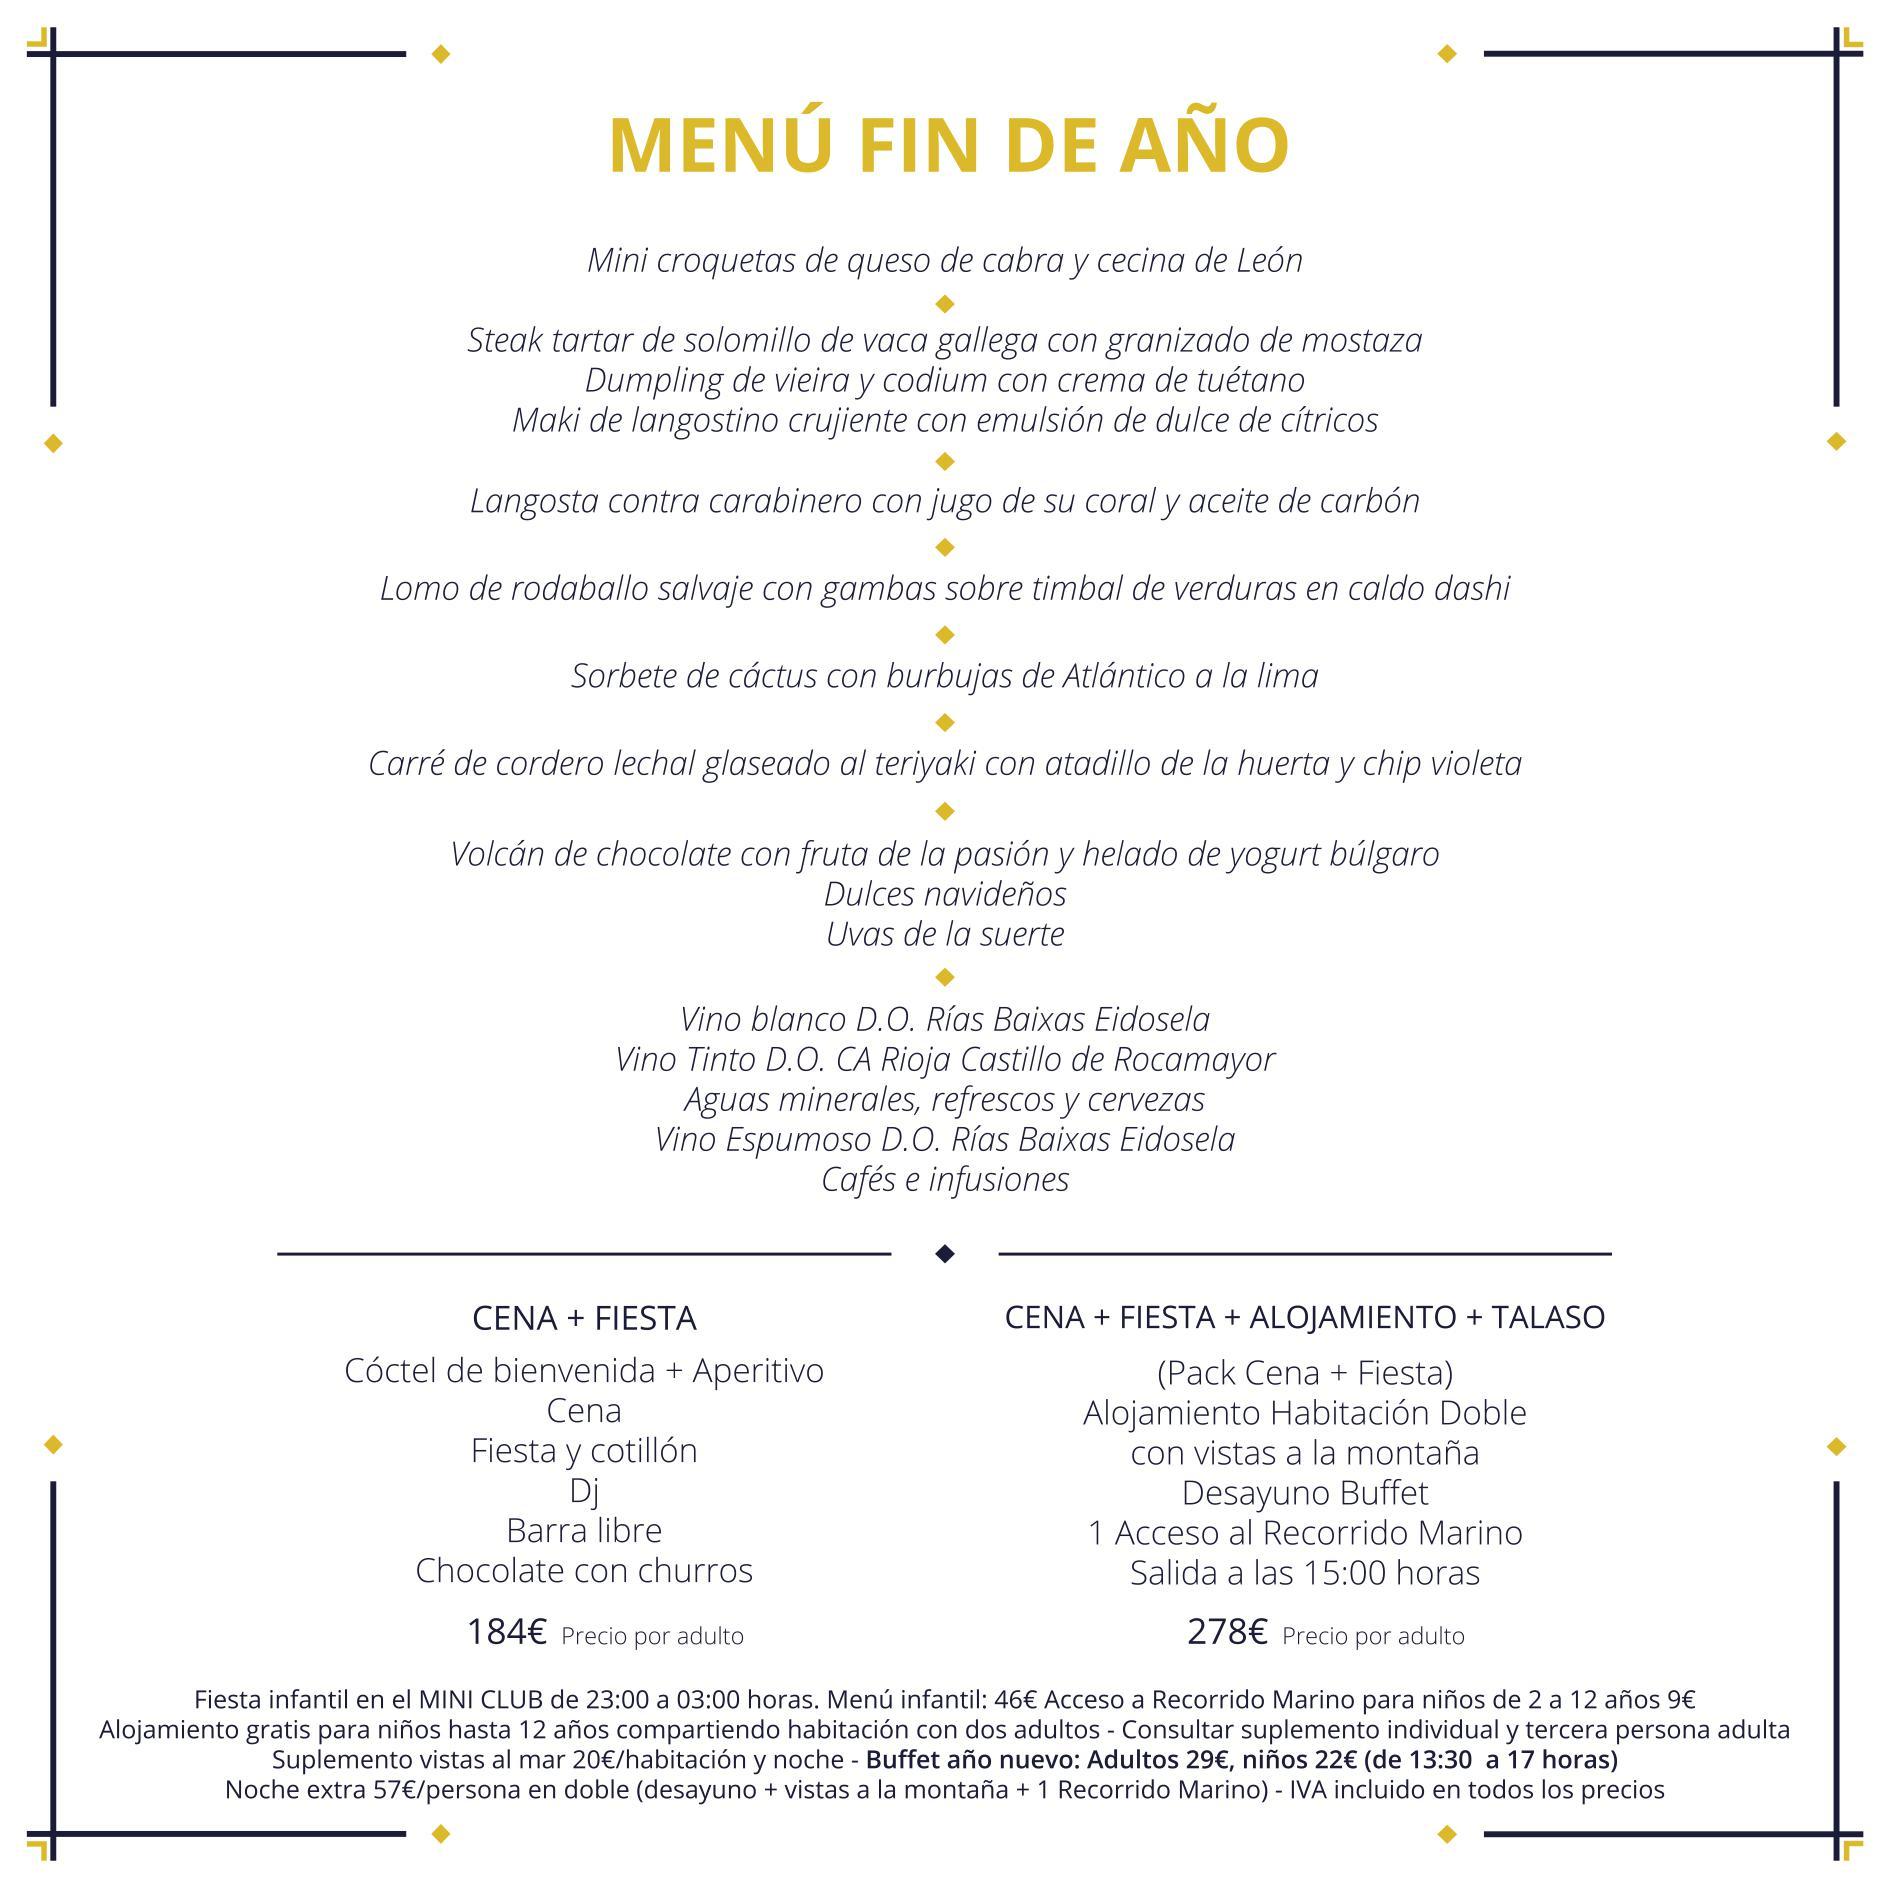 Hotel talasoterapia con restaurante para bodas y eventos for Menu de fin de ano en casa